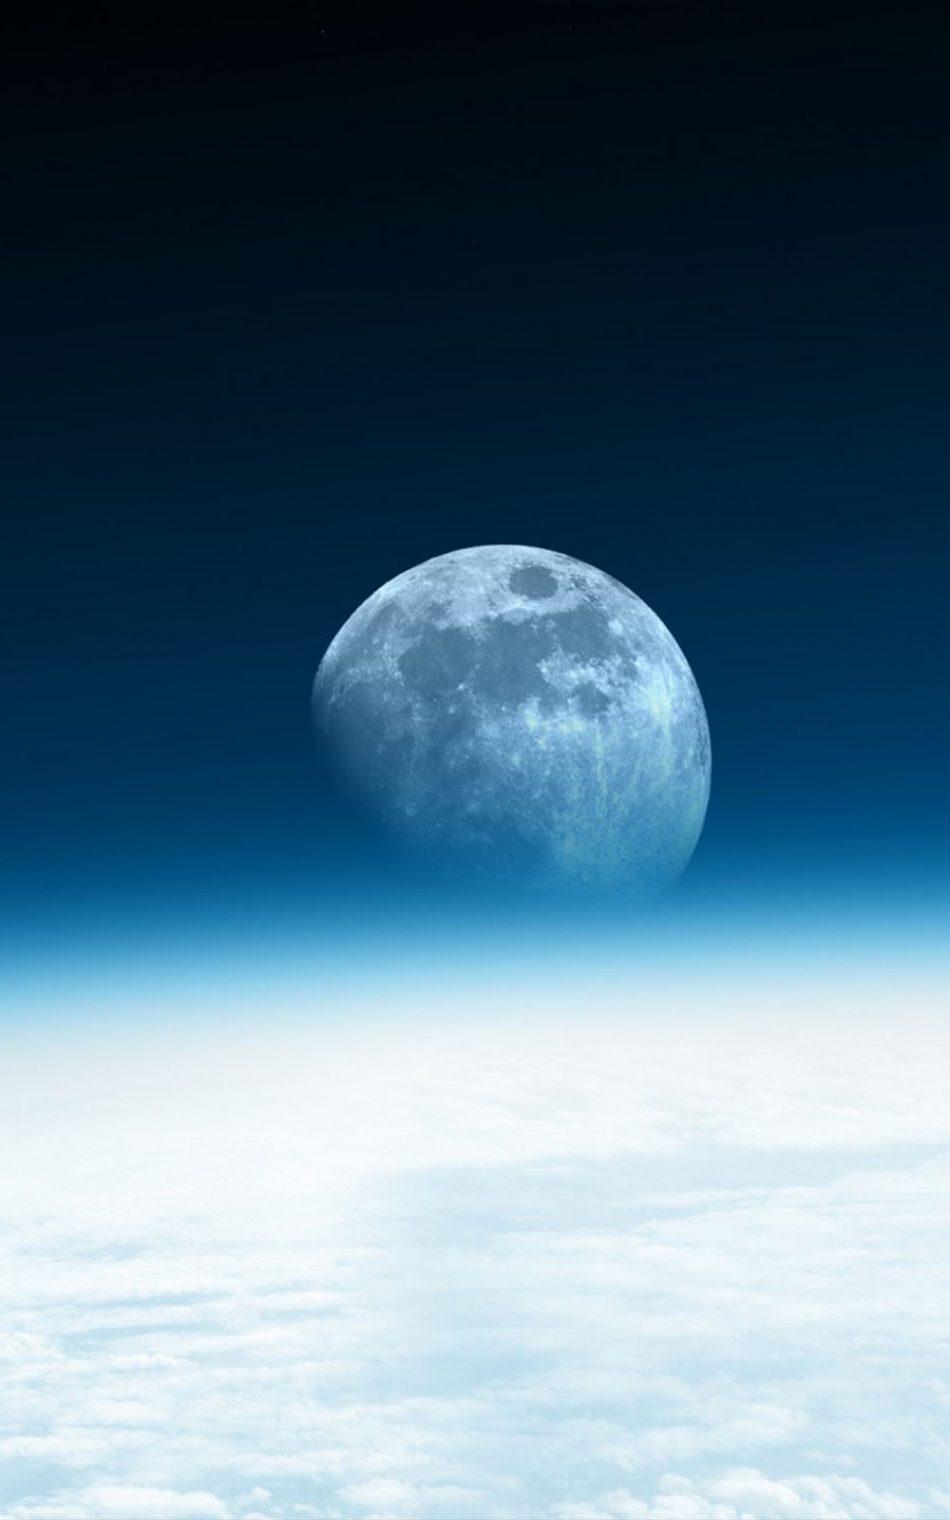 Moon Horizon Blue Space Free 4K Ultra HD Mobile Wallpaper